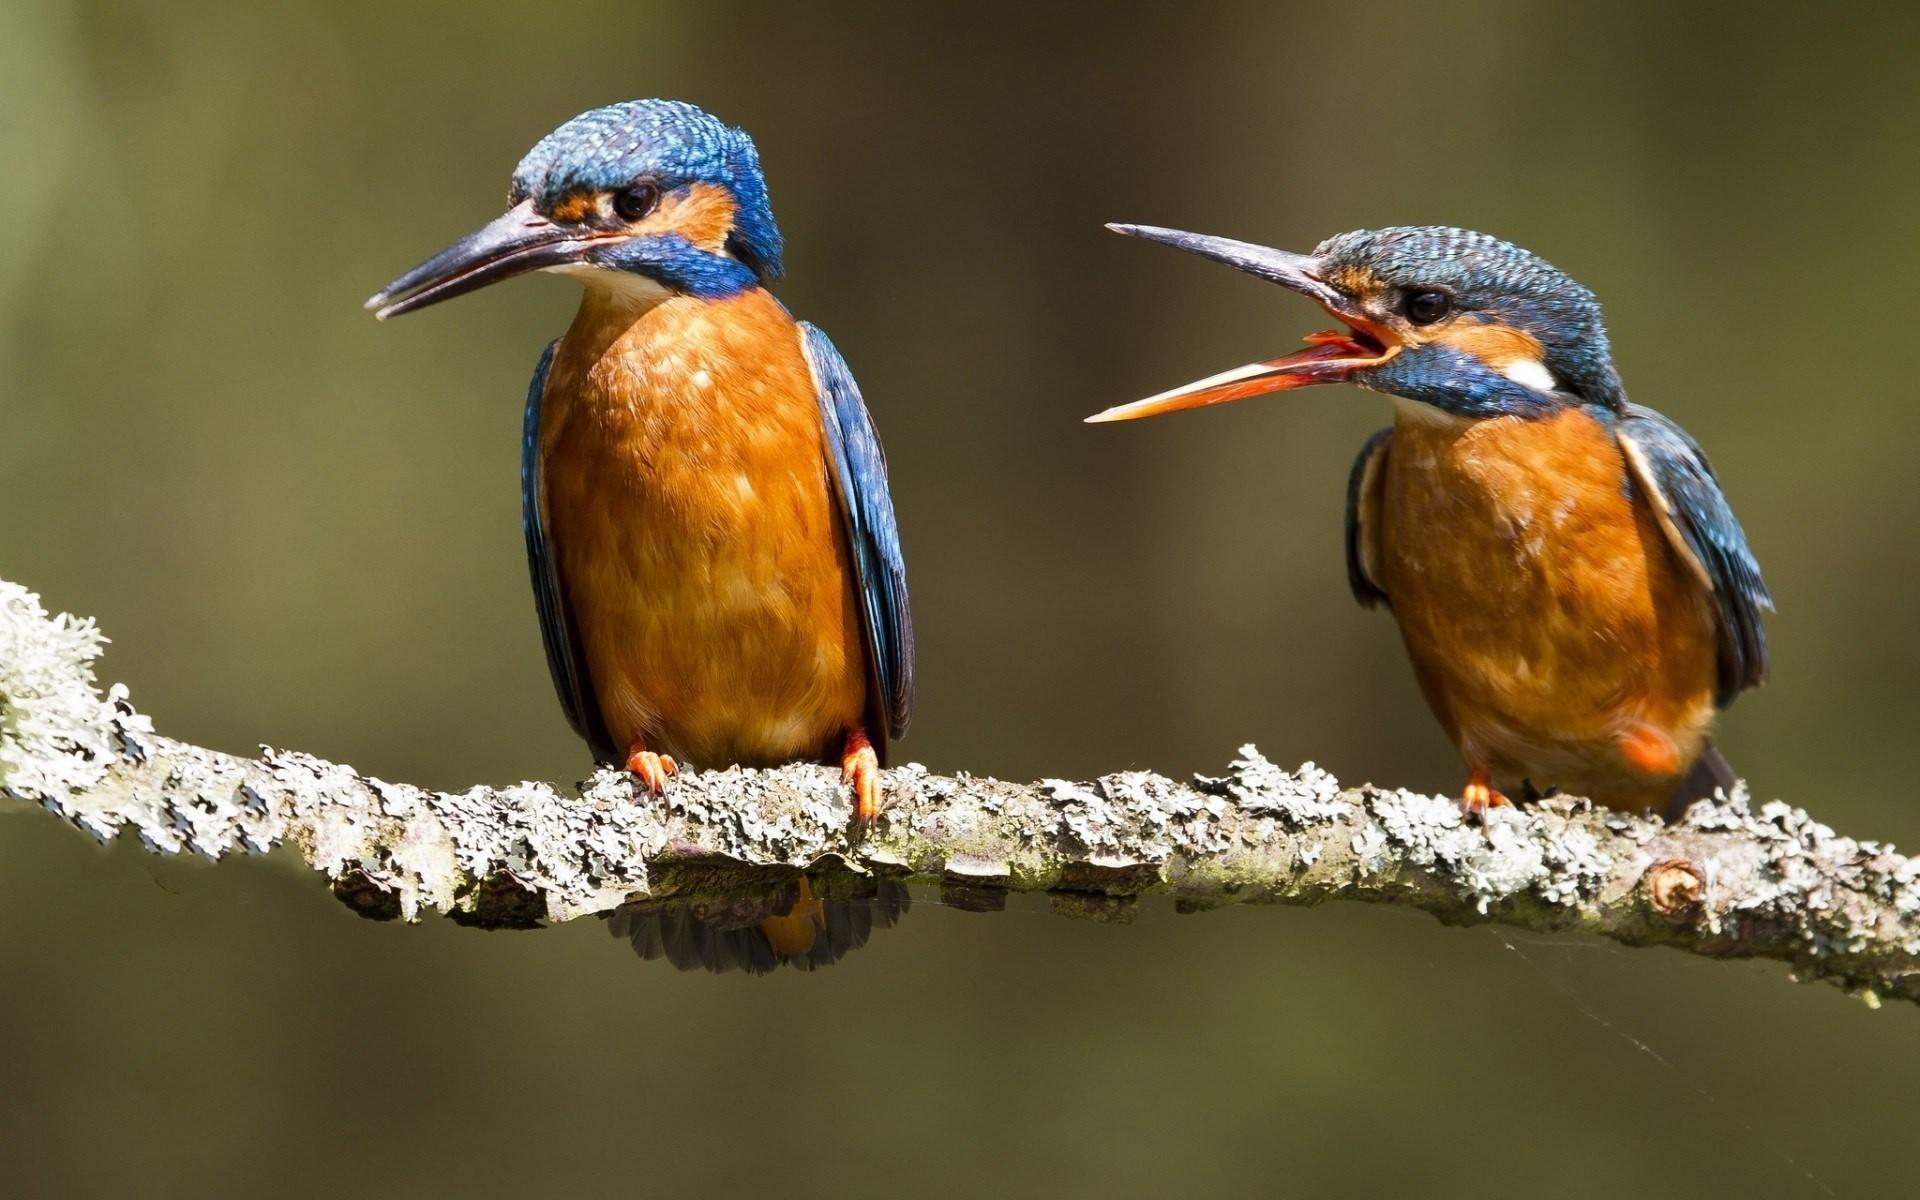 desktopgraphy.com-animals-arguing-birds-bird-high-resolution.jpg